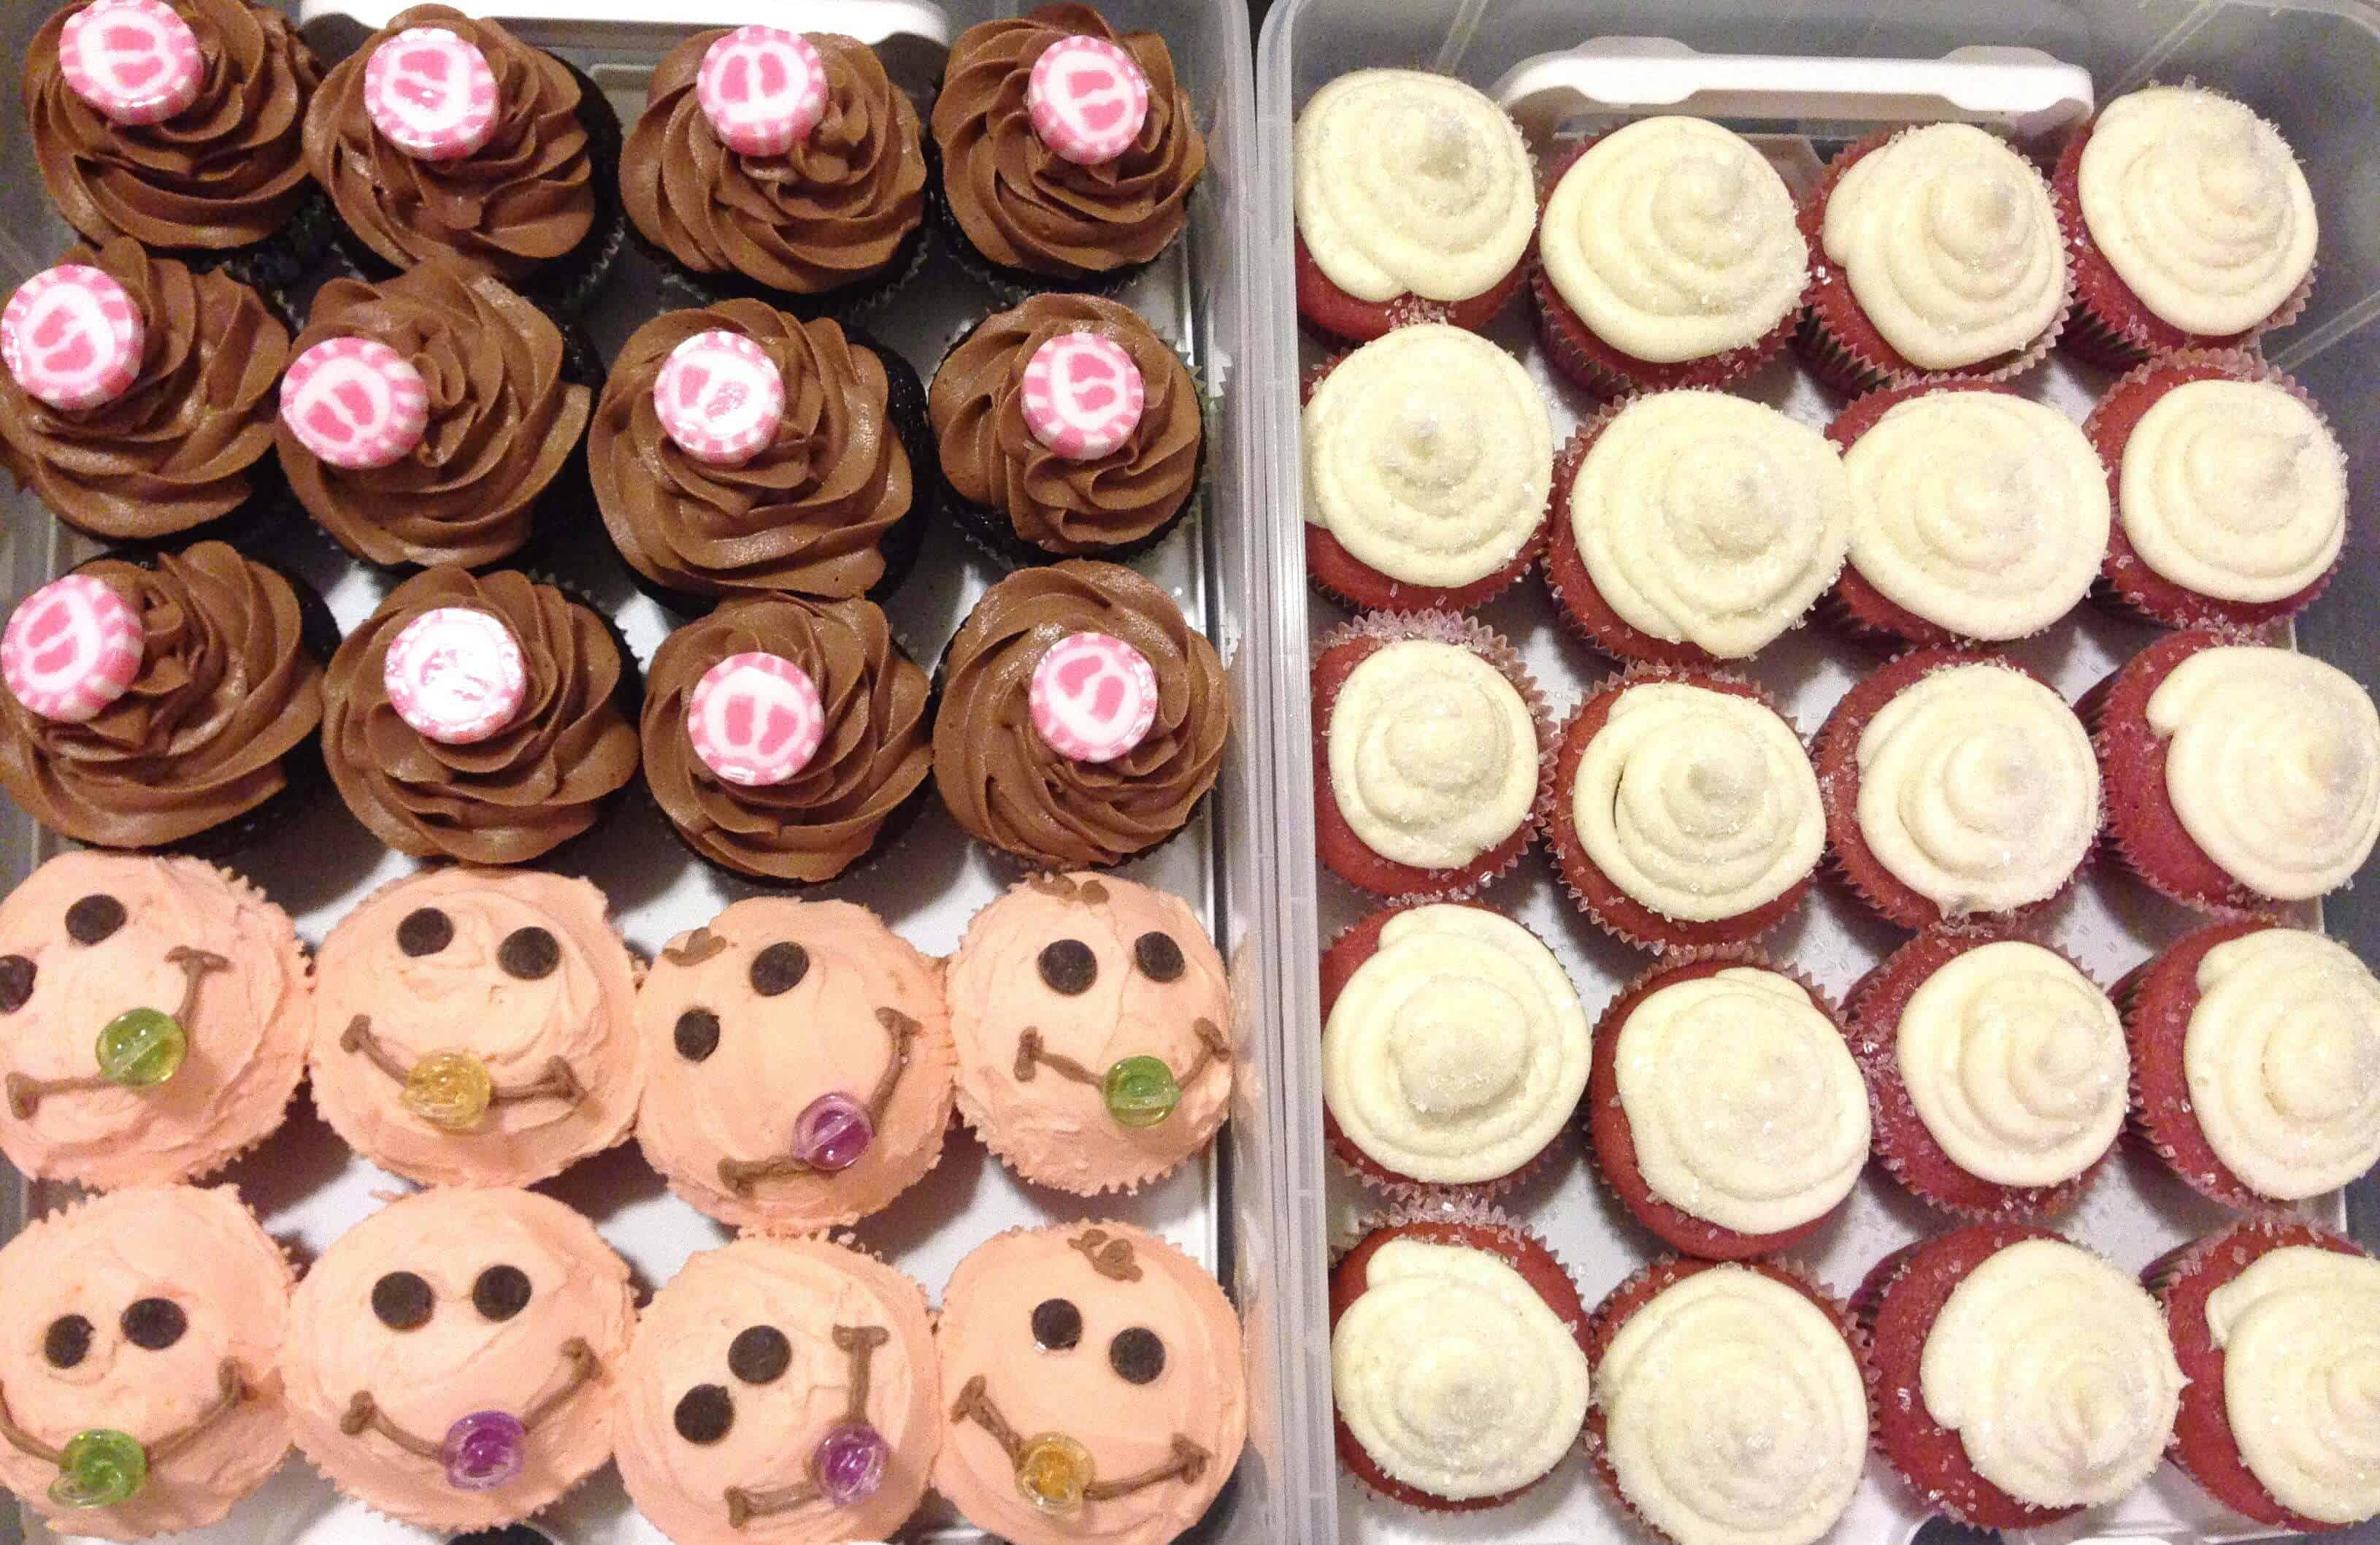 Spiksplinternieuw It's a GIRL!!! Baby Shower Cupcakes - Chelsweets DL-96